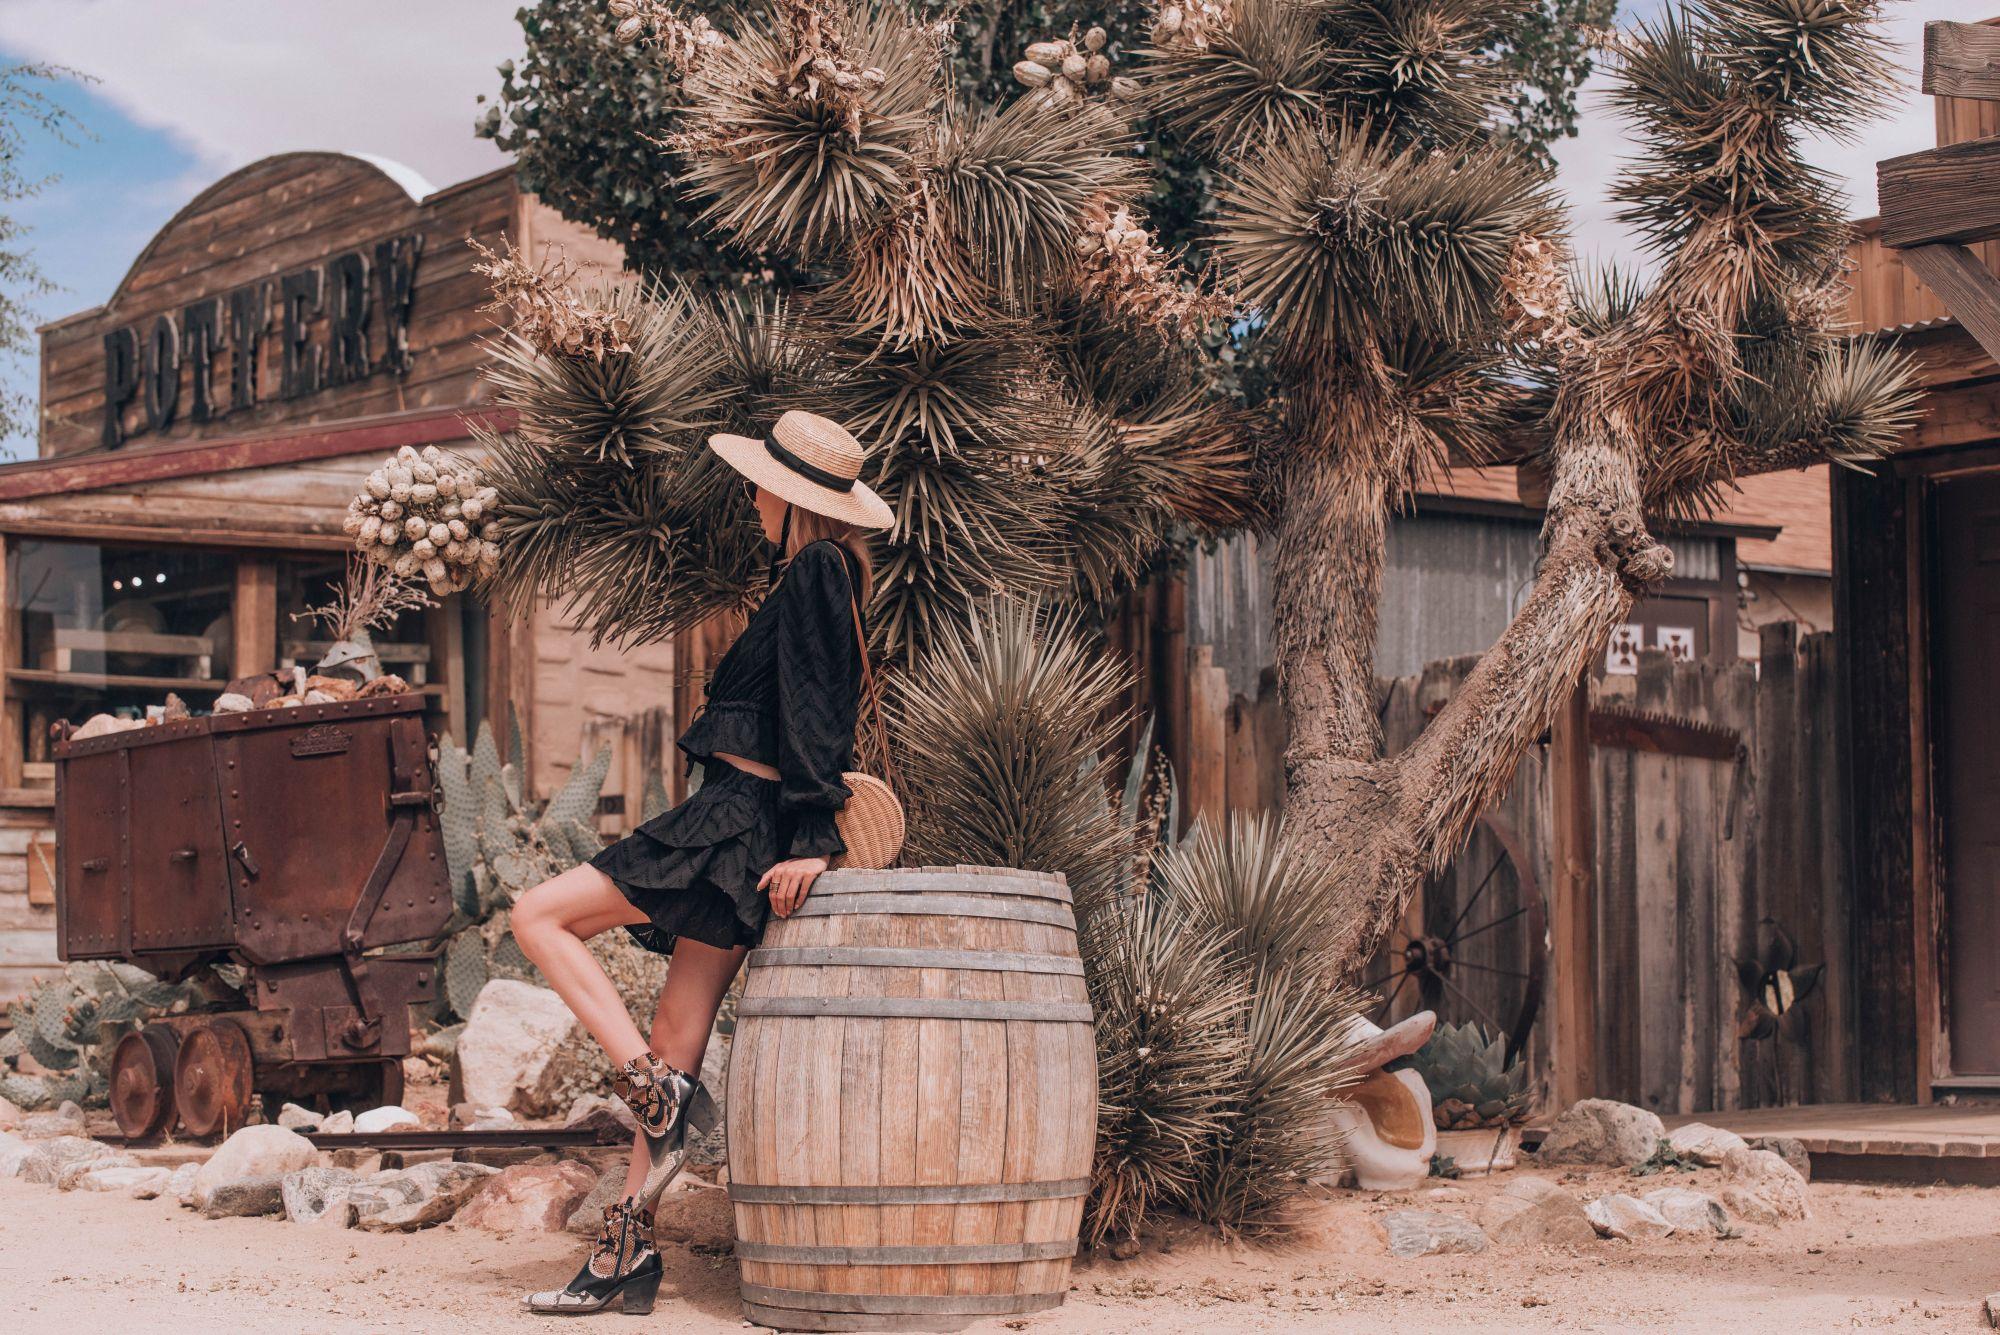 miasteczko westernowe